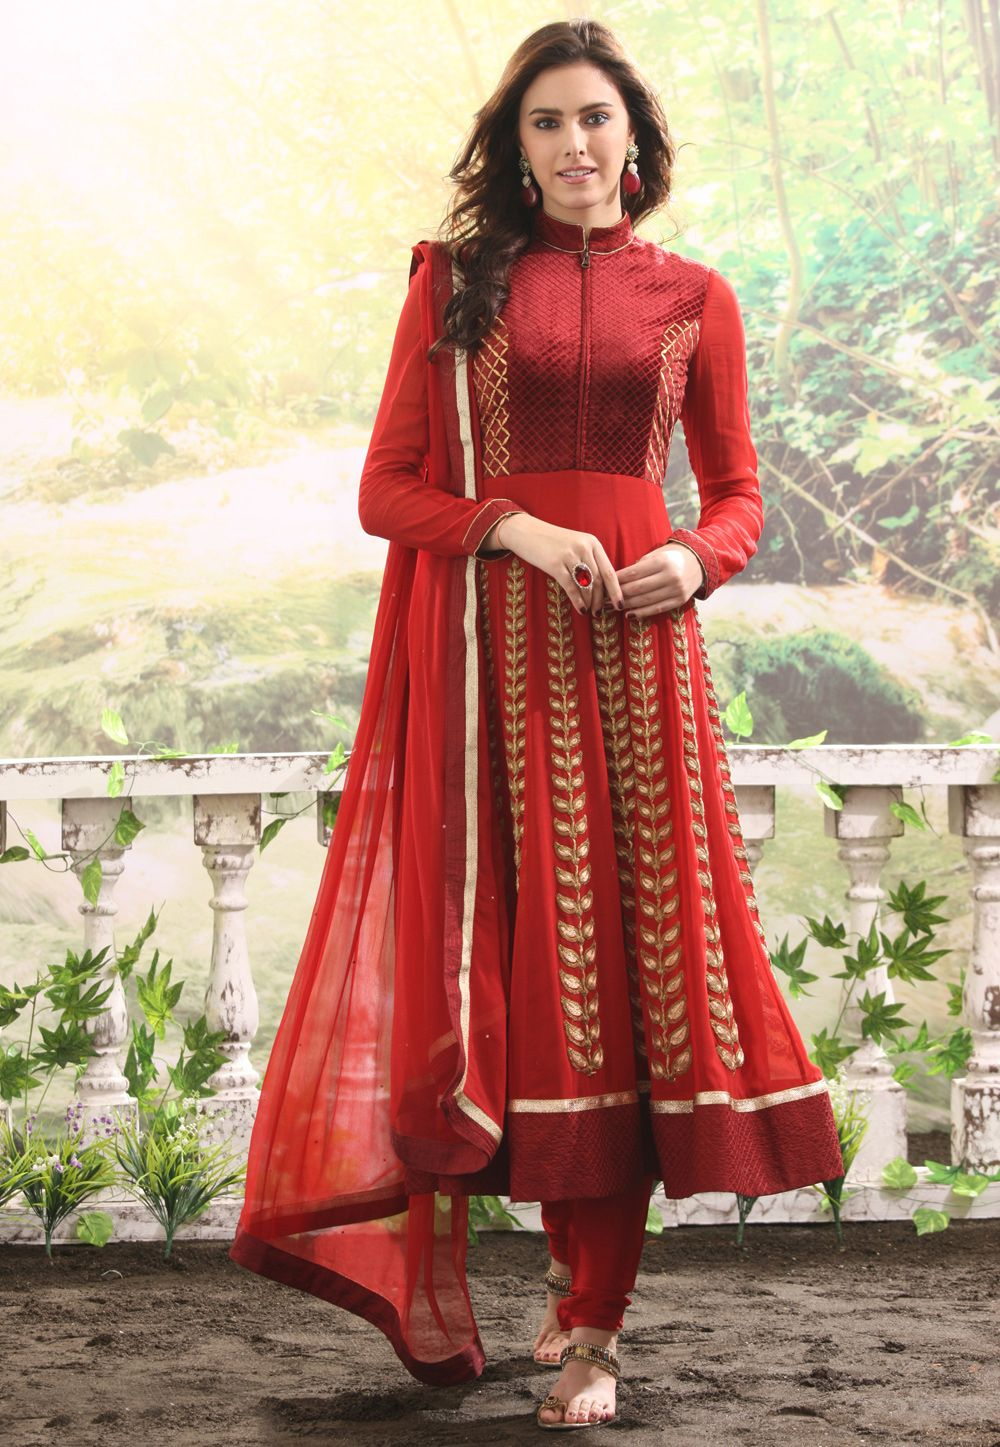 Red heavy bridal anarkali frock 7 suitanarkali in - Maroon And Red Faux Georgette Anarkali Churidar Kameez Online Shopping